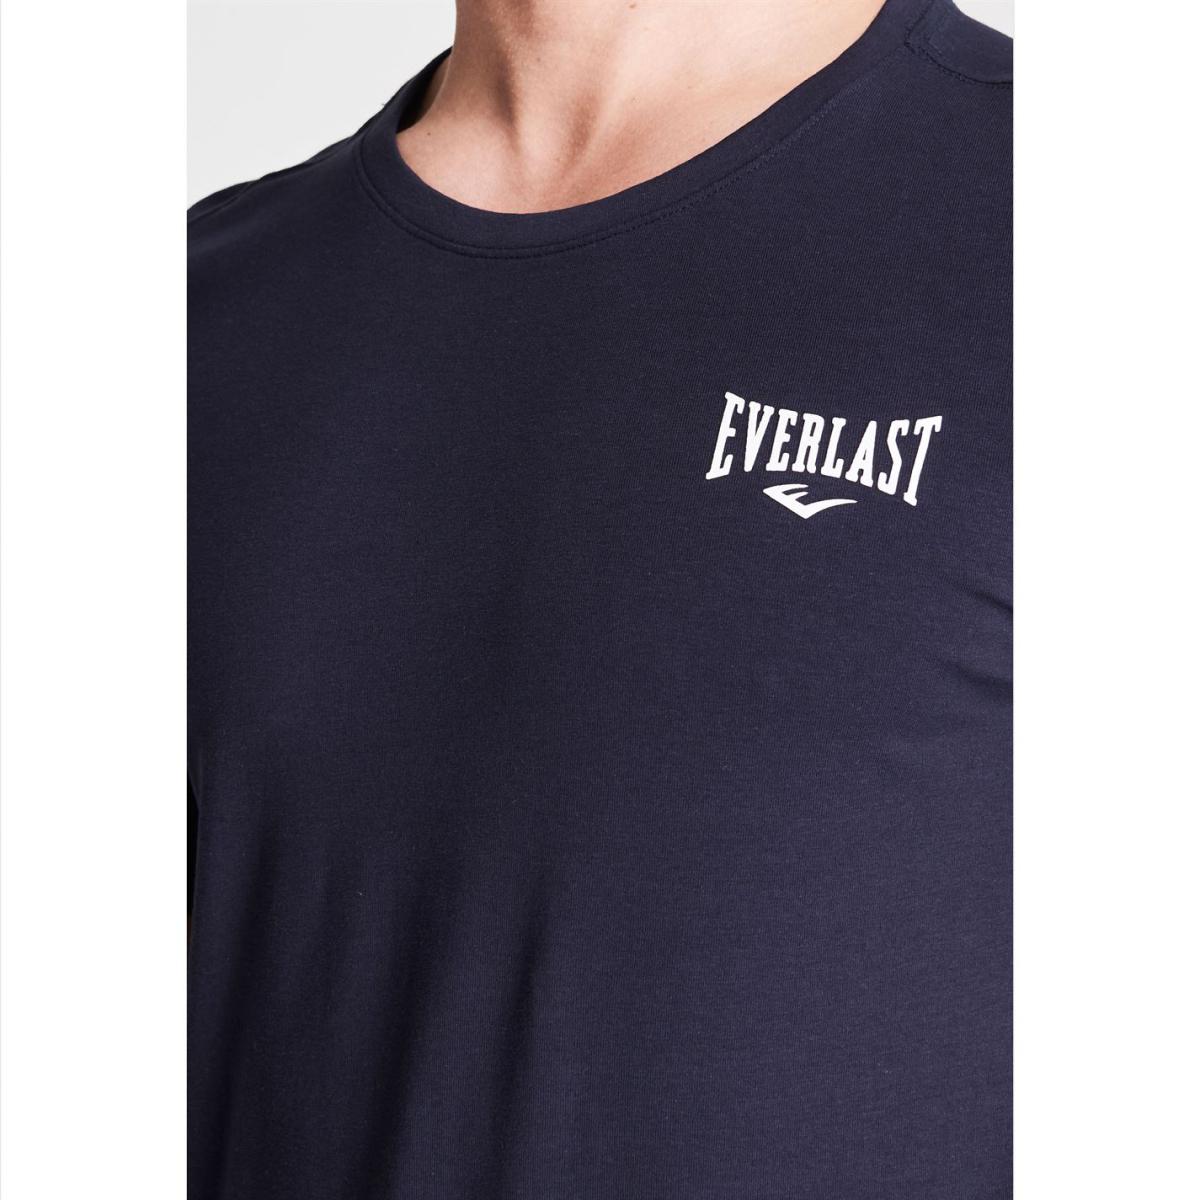 Crosshatch T-Shirt T shirt Tshirt Kurzarm Herren Top Freizeit Casual Shamen 1873